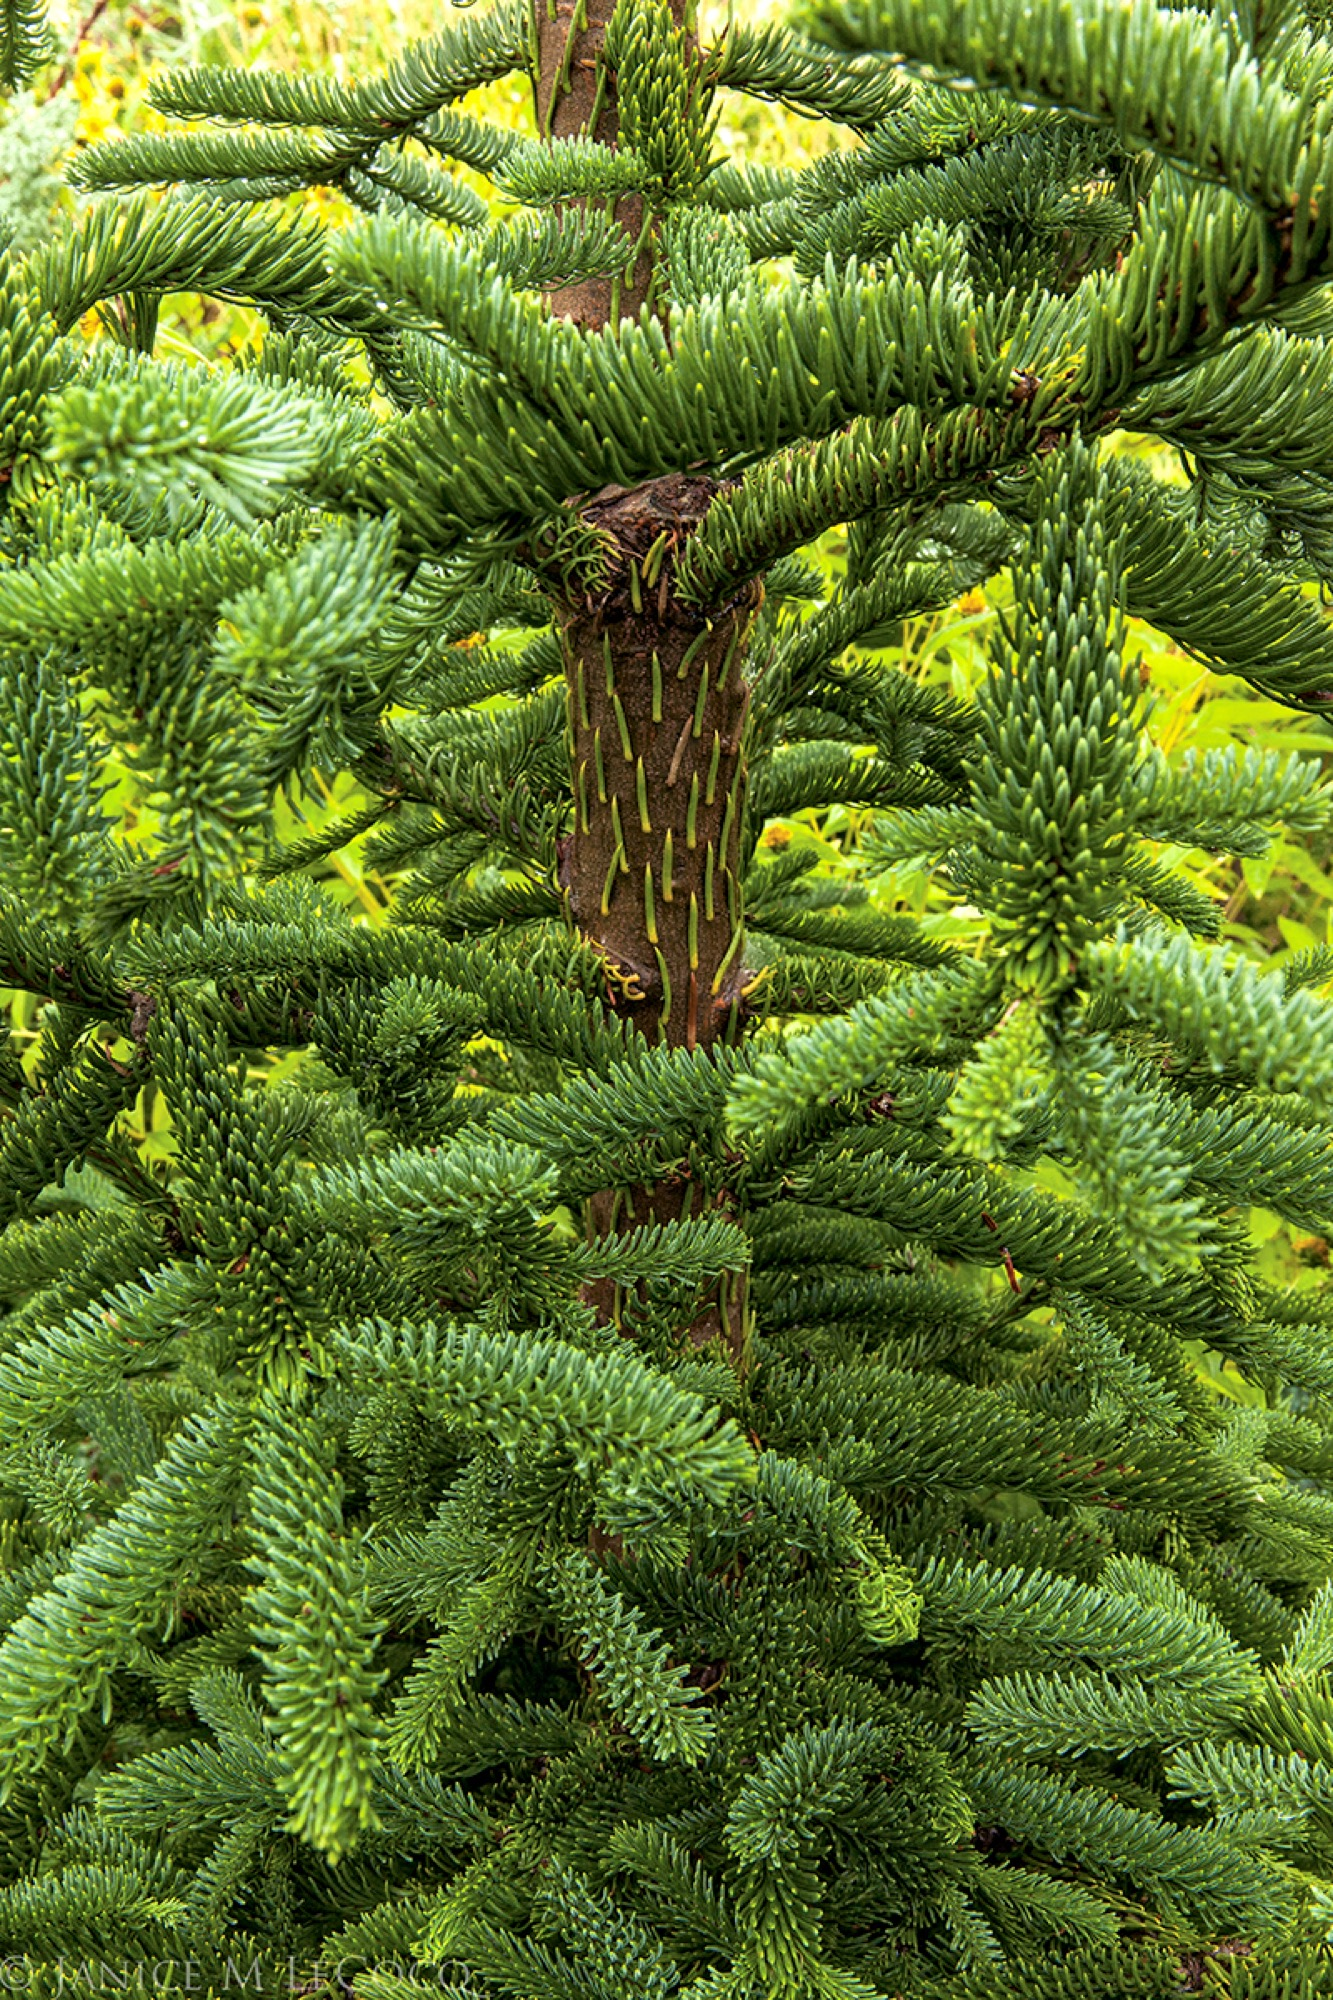 fir, conifer, foliage gardening